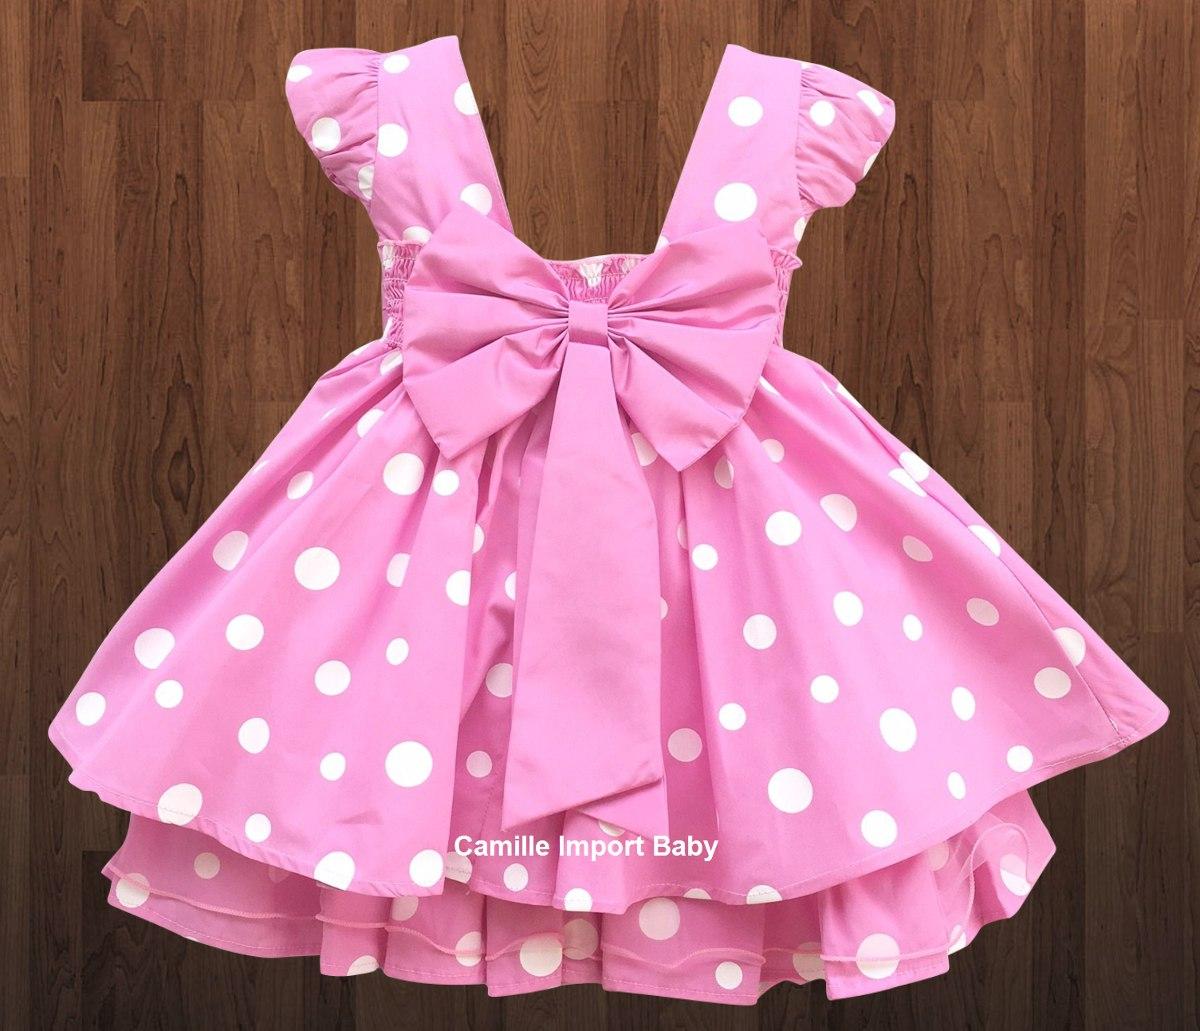 Vestido Minnie Rosa Luxo Infantil Luxo Com 2 Tiaras Minei R 100